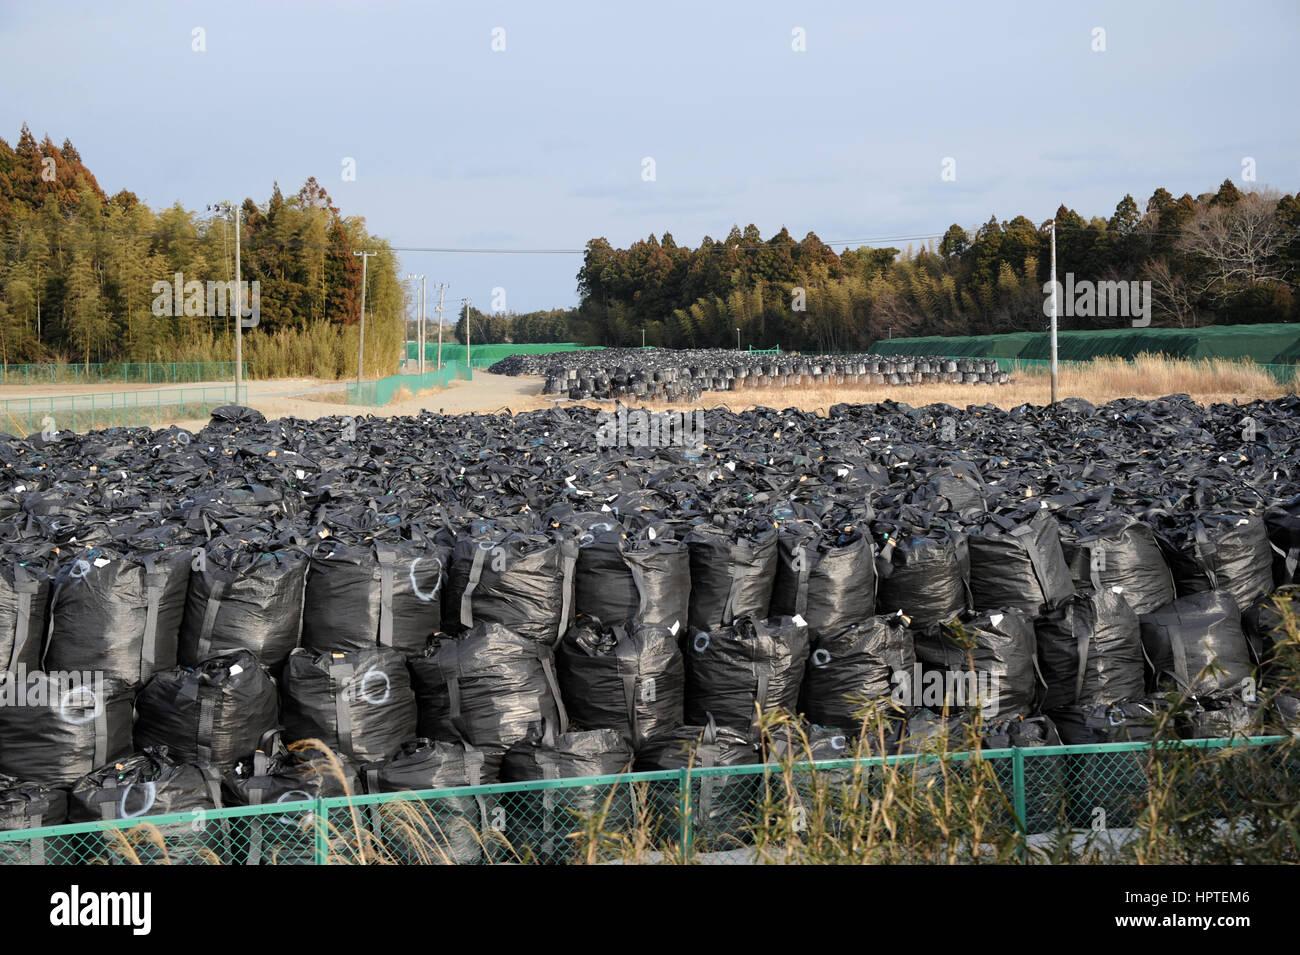 (170225) -- FUKUSHIMA(JAPAN), Feb. 25, 2017 (Xinhua) -- Photo taken on Feb. 22, 2017 shows bags of contaminated - Stock Image